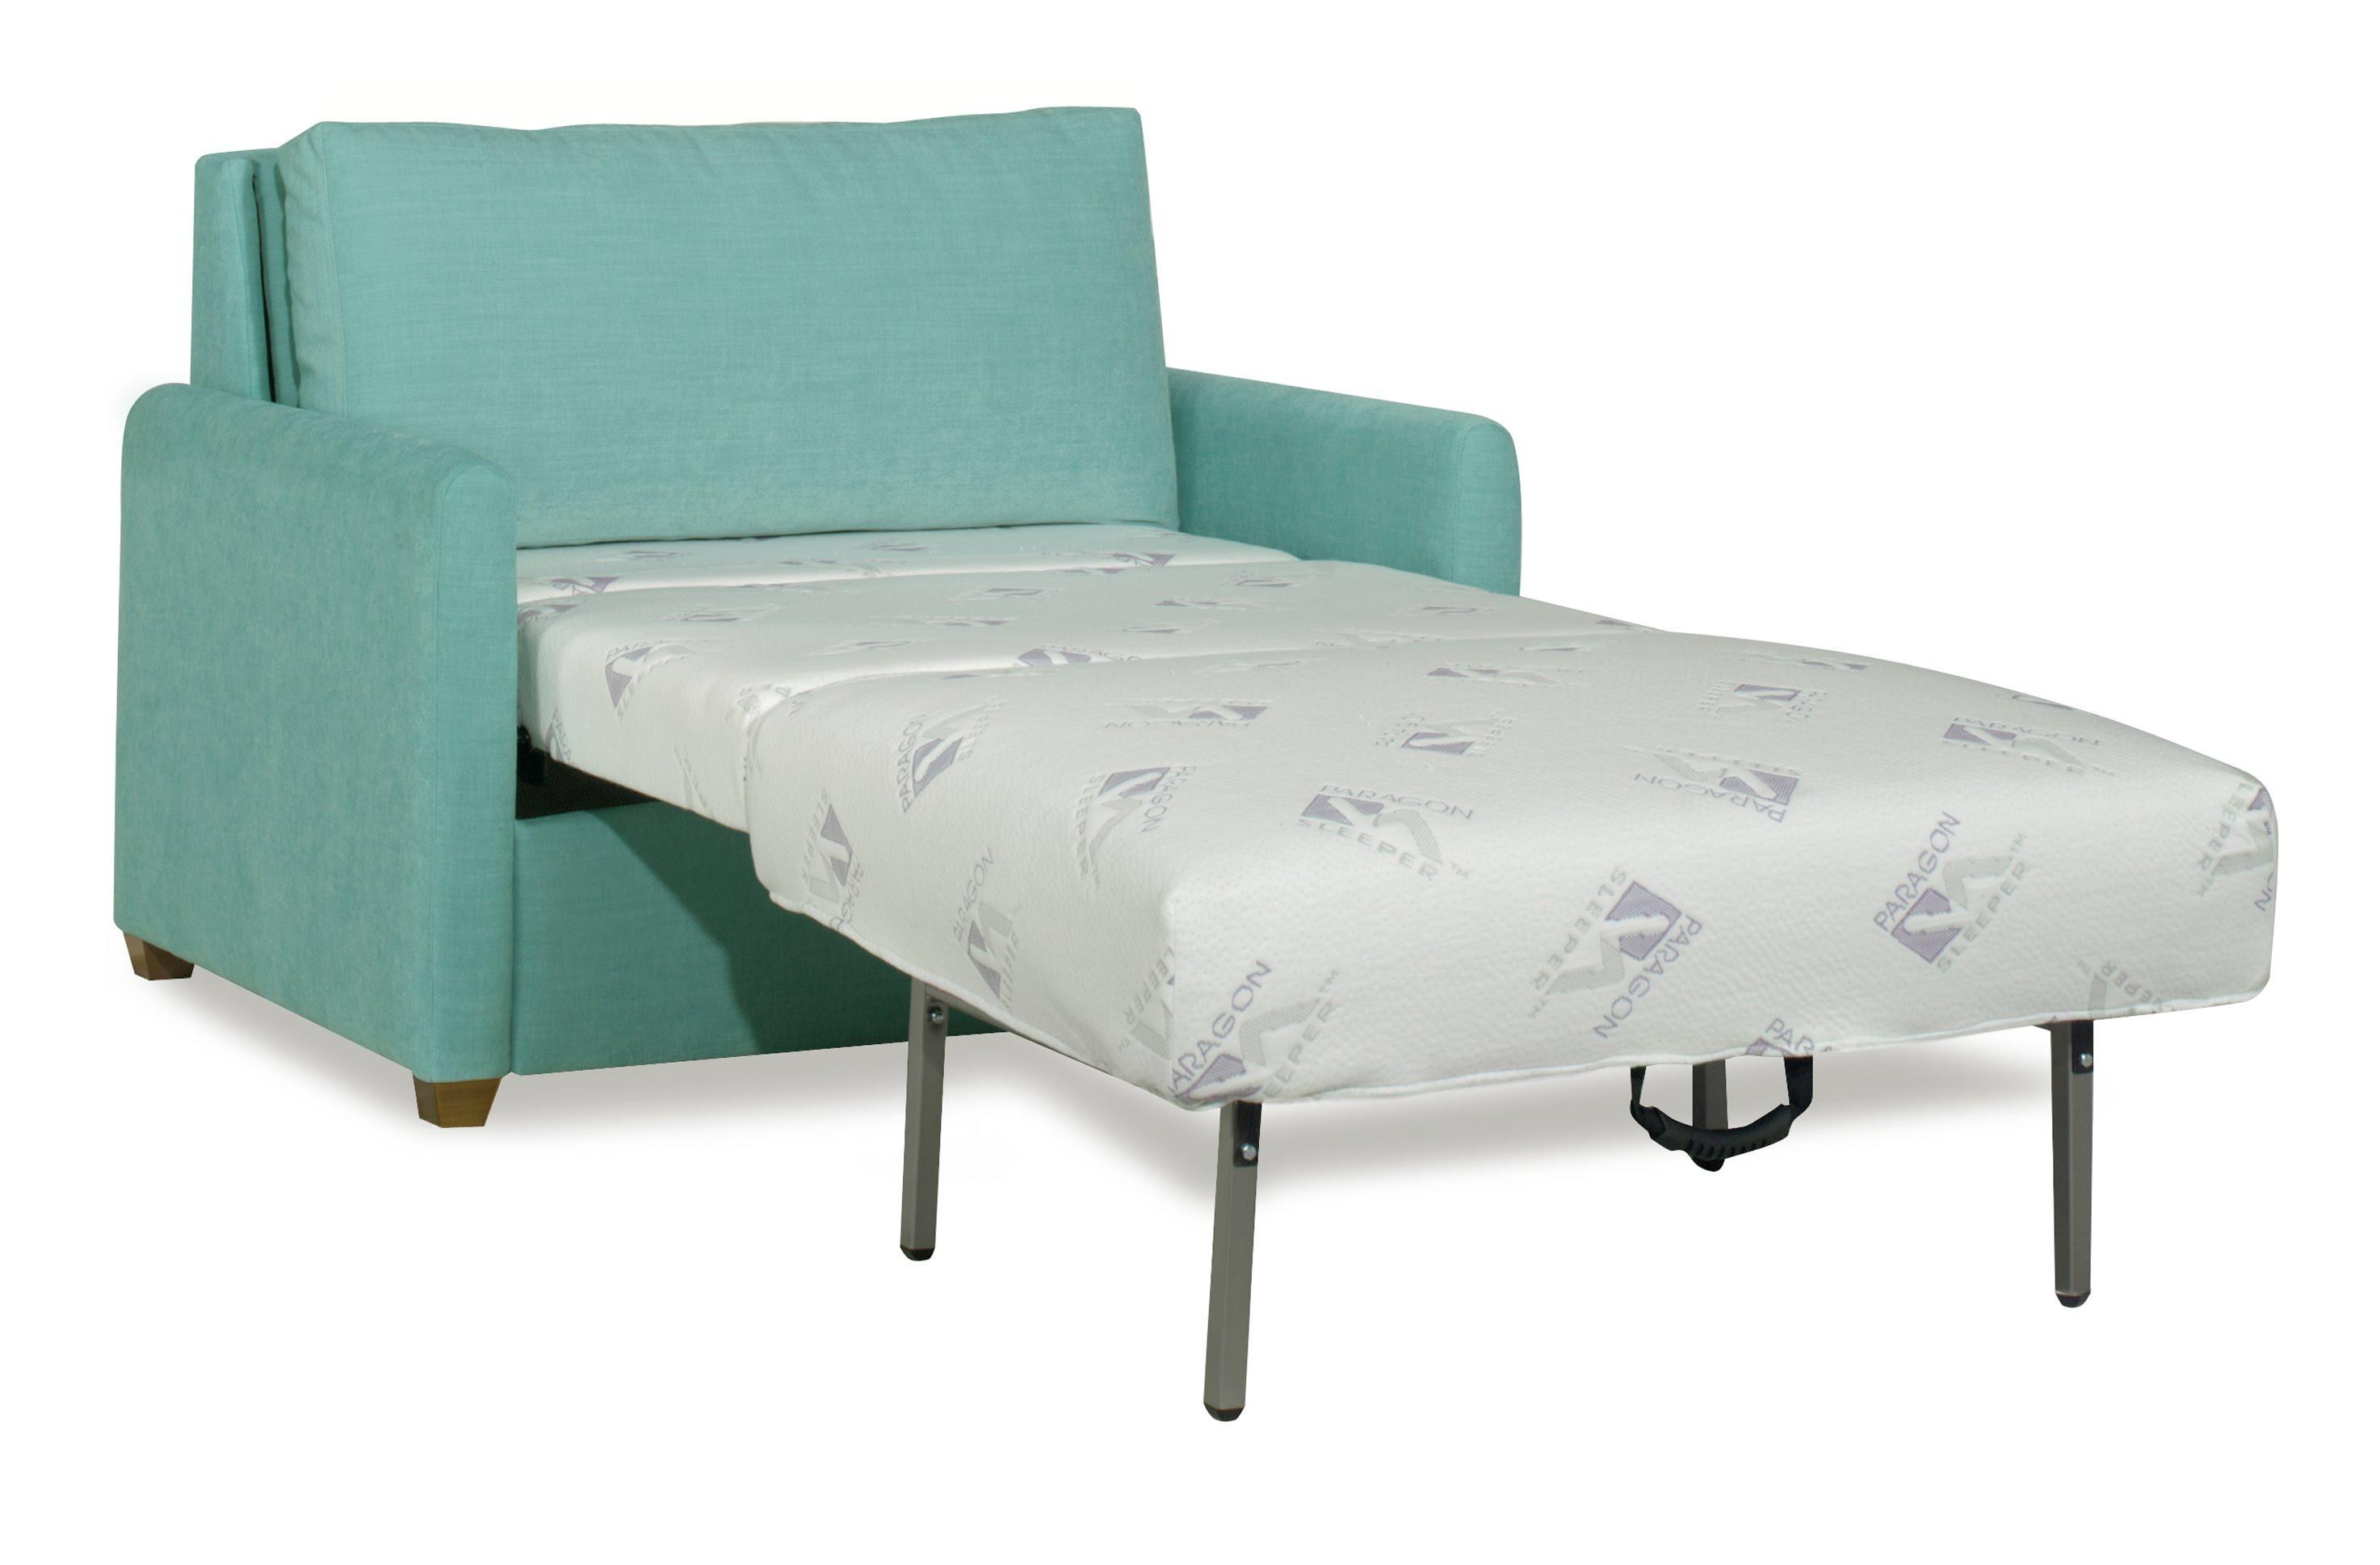 Twin Sleeper Chair | Twin Sleeper Chair Crate And Barrel – Youtube With Crate And Barrel Sleeper Sofas (Image 19 of 20)